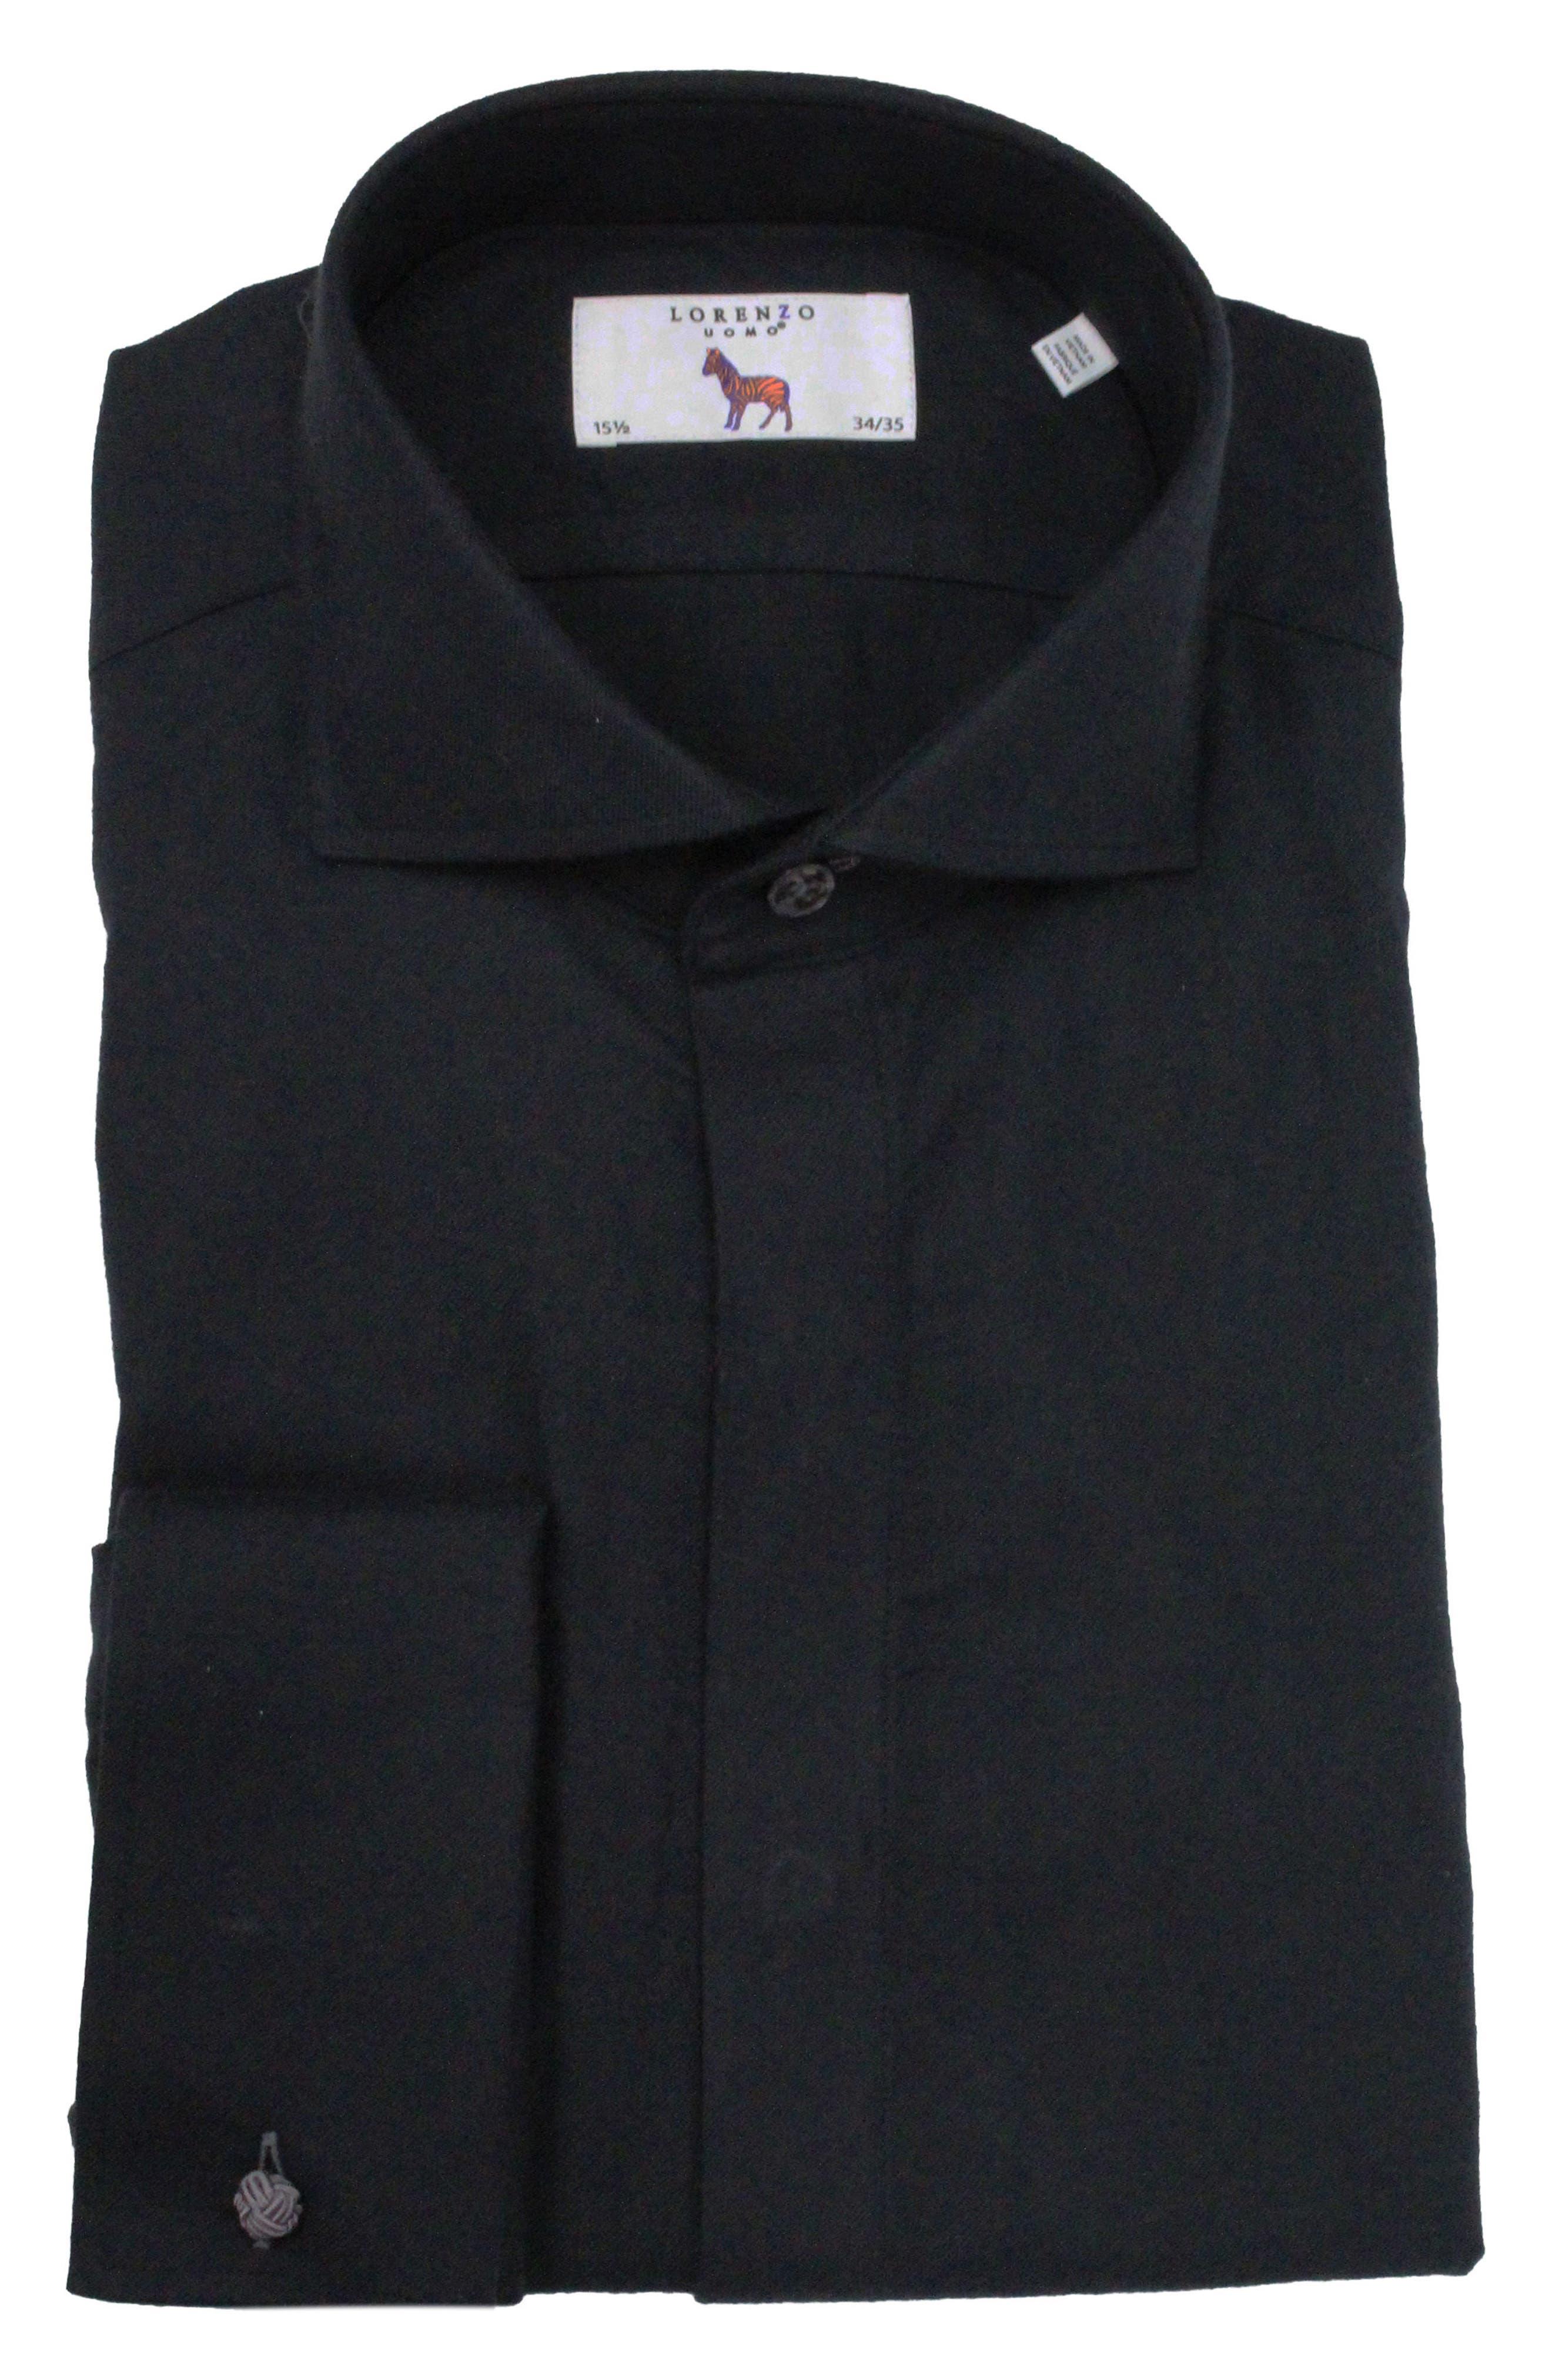 Trim Fit Tuxedo Shirt